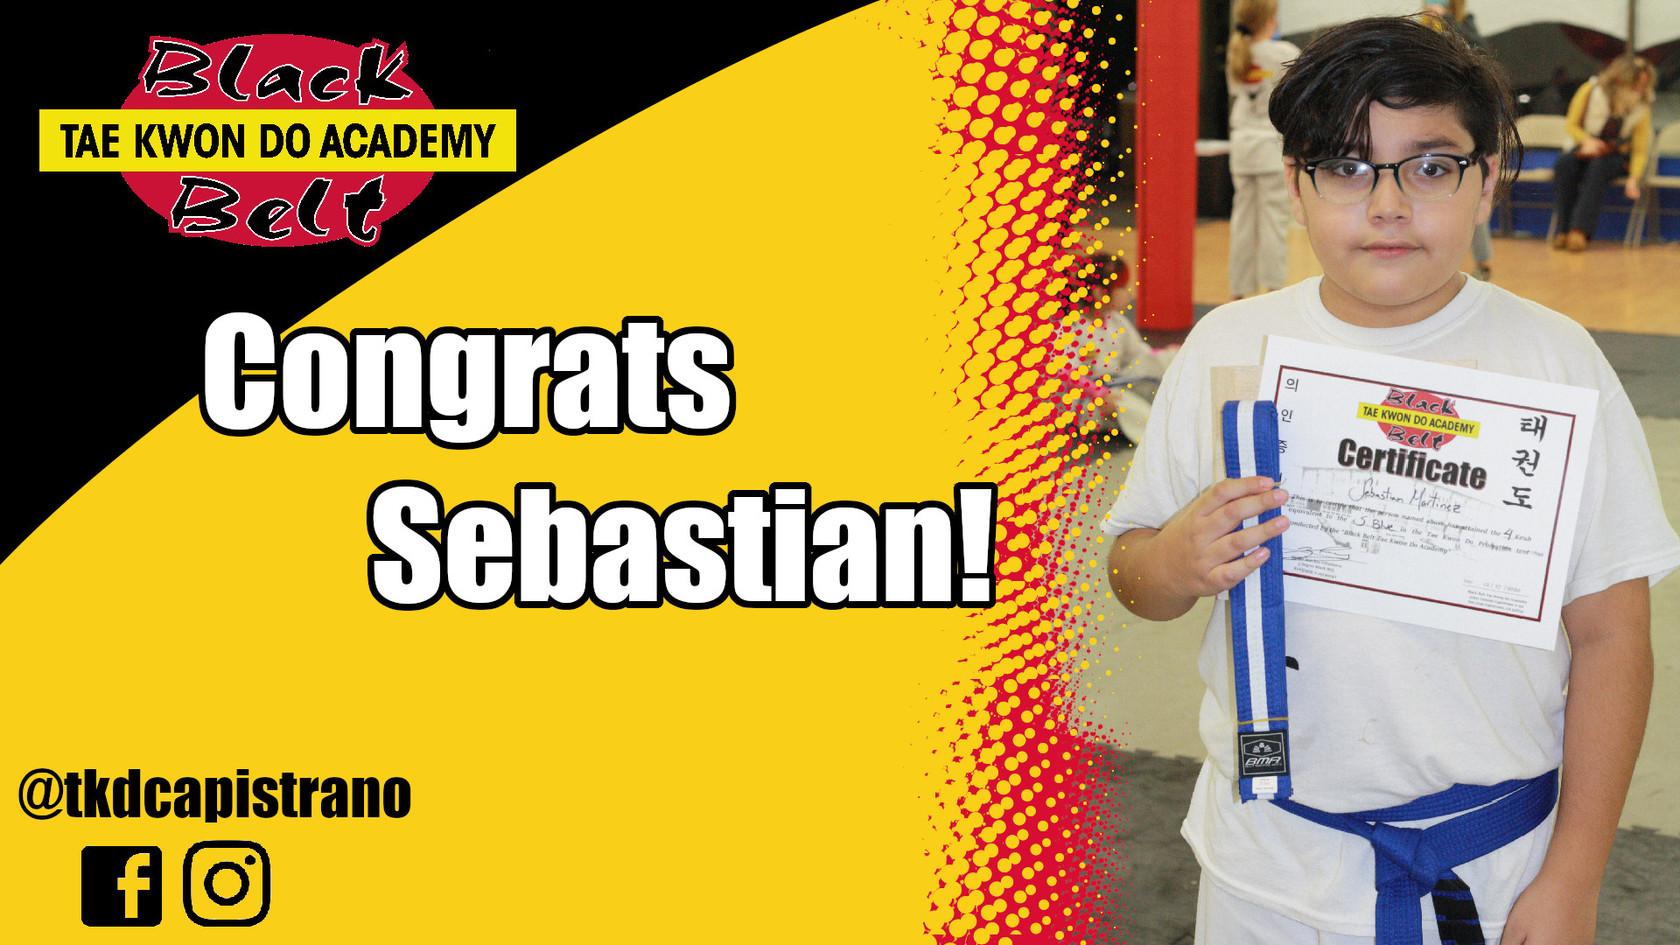 Congrats Sebastian!